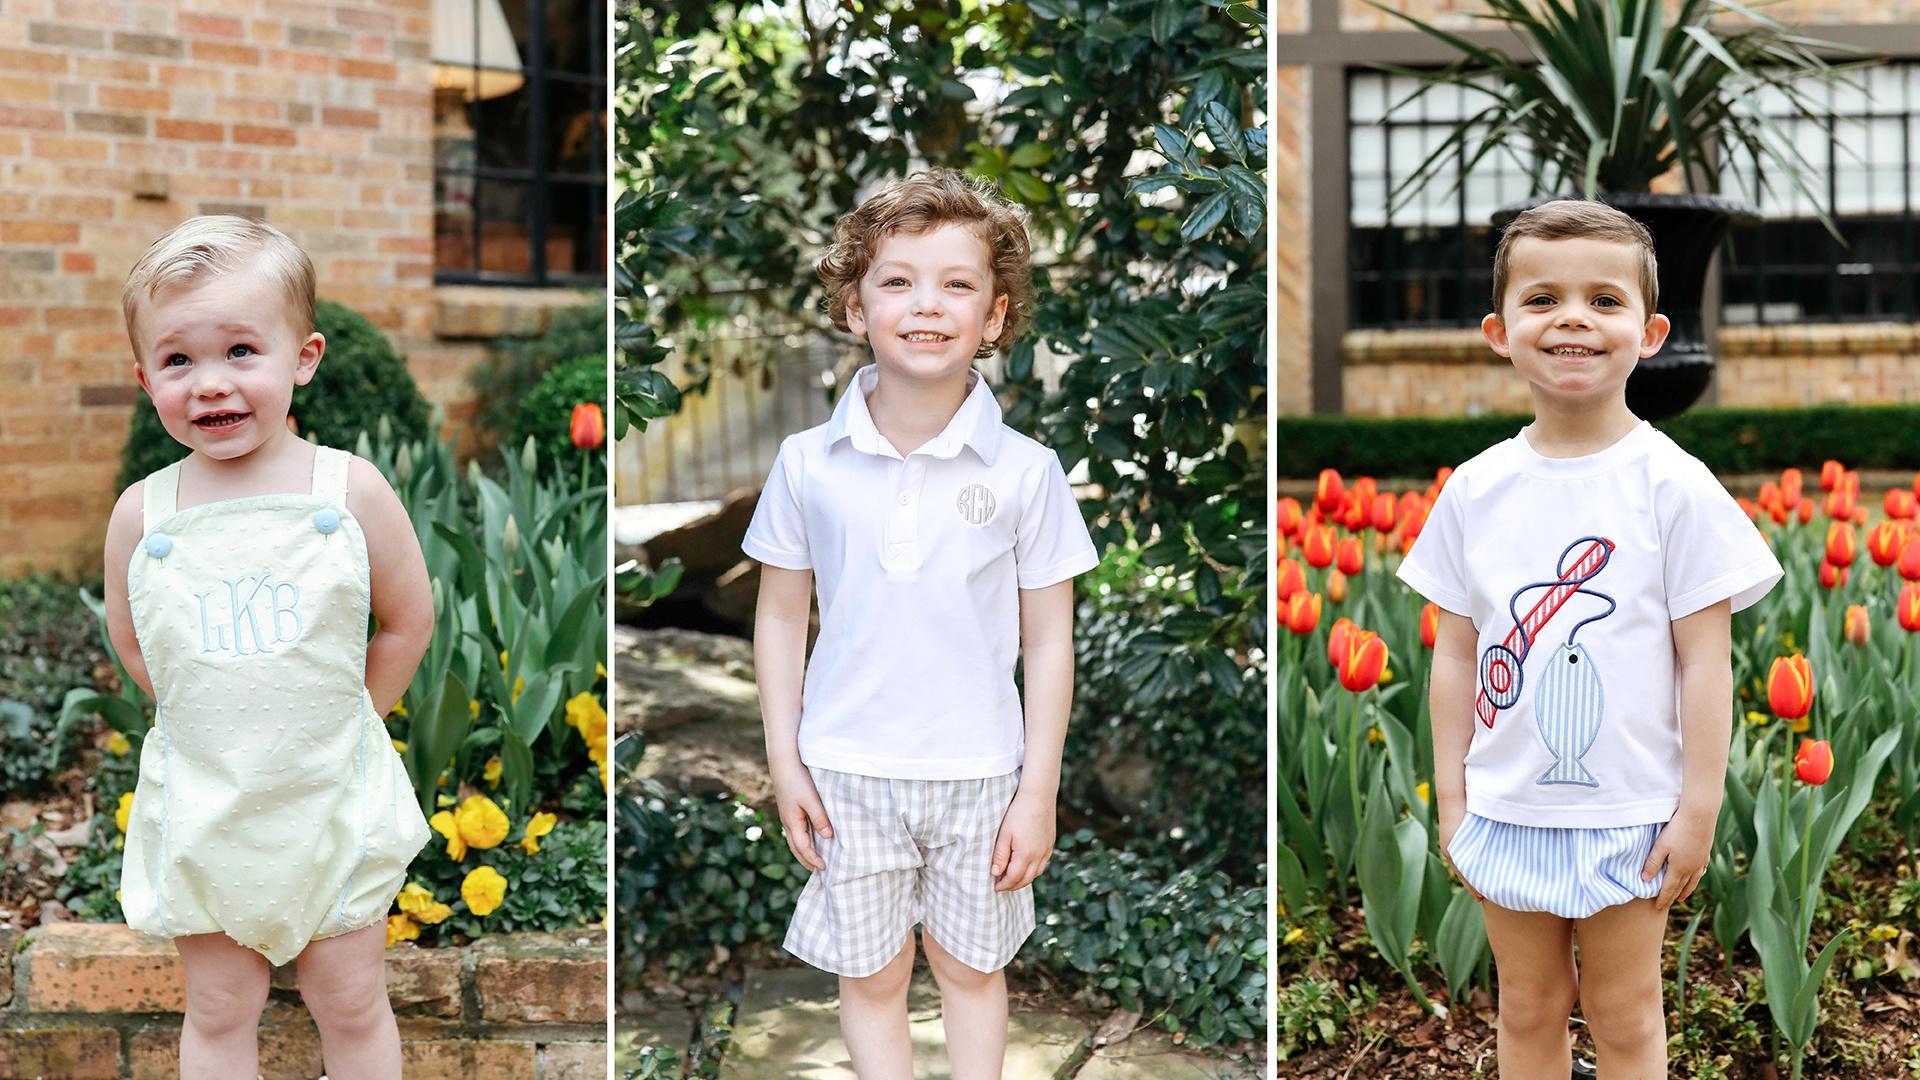 Boys Spring Clothing - Boys Summer Clothing